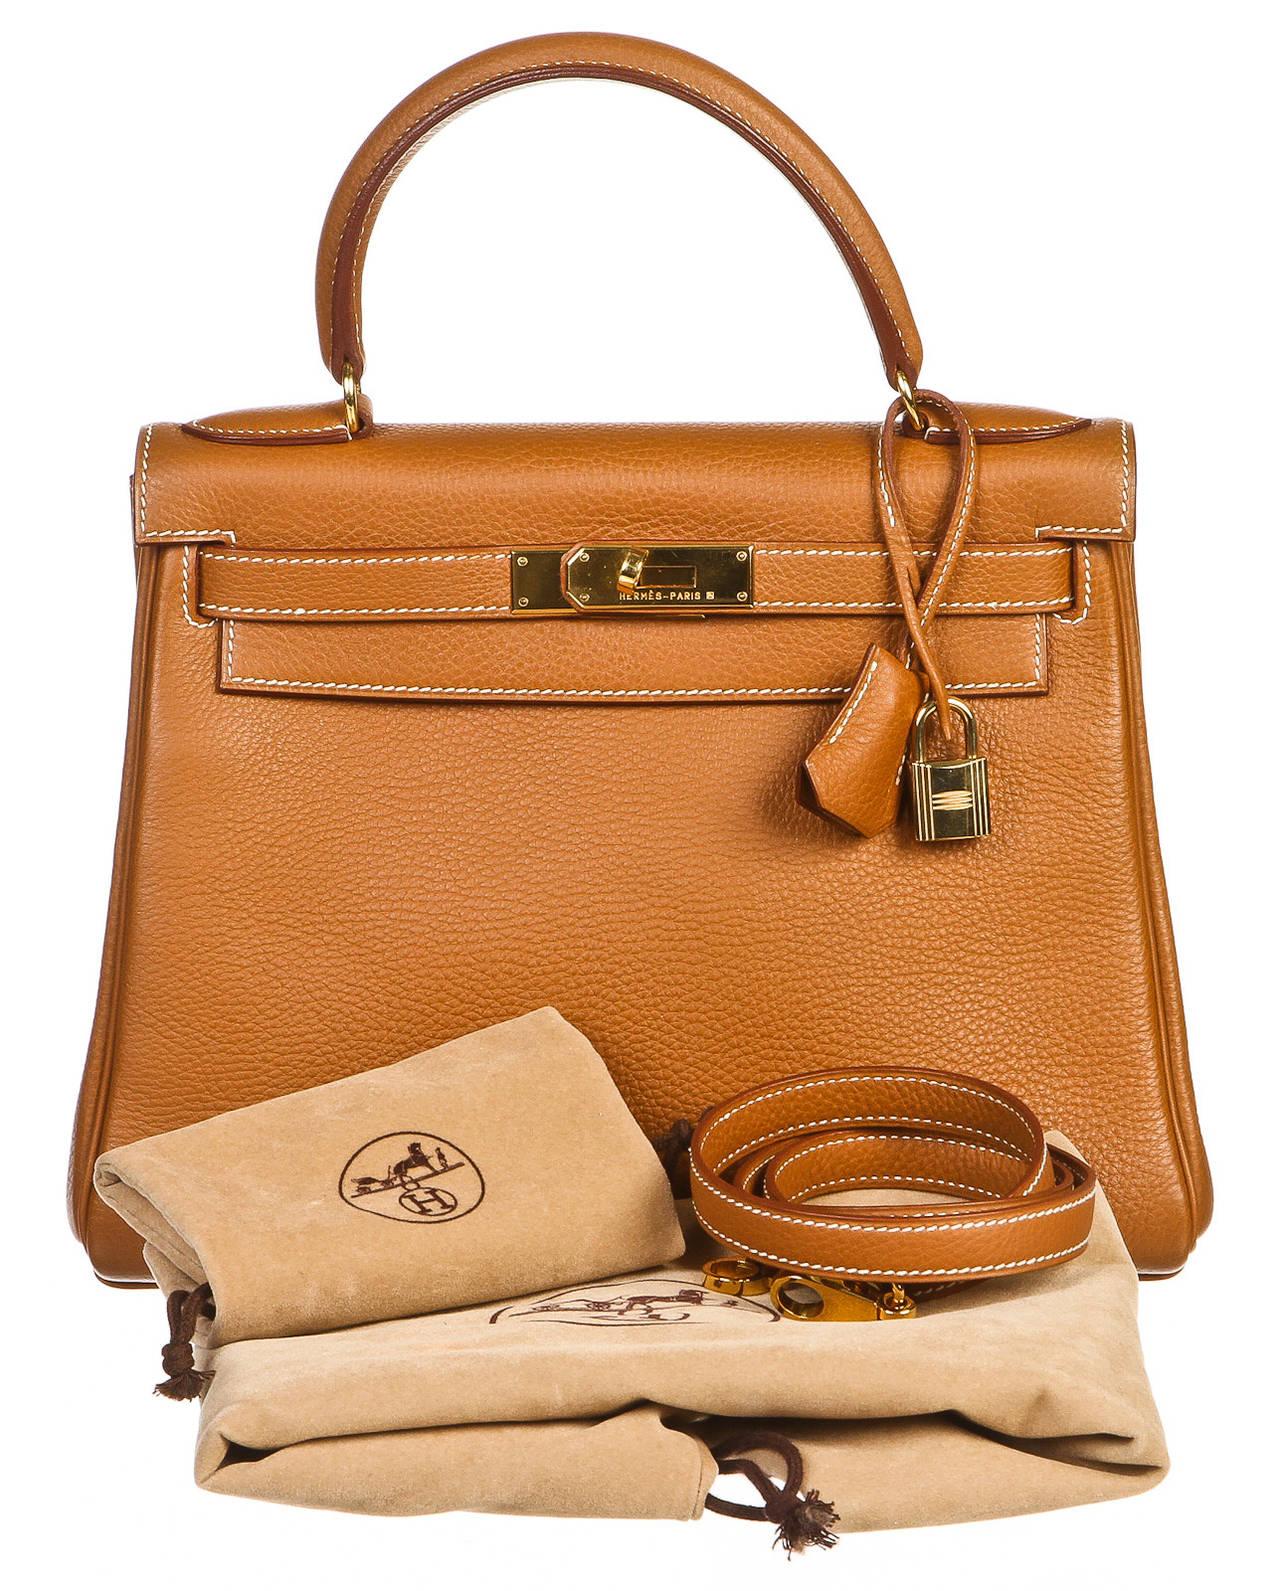 Hermes Gold Clemence Leather 28cm Kelly Retourne Handbag at 1stdibs